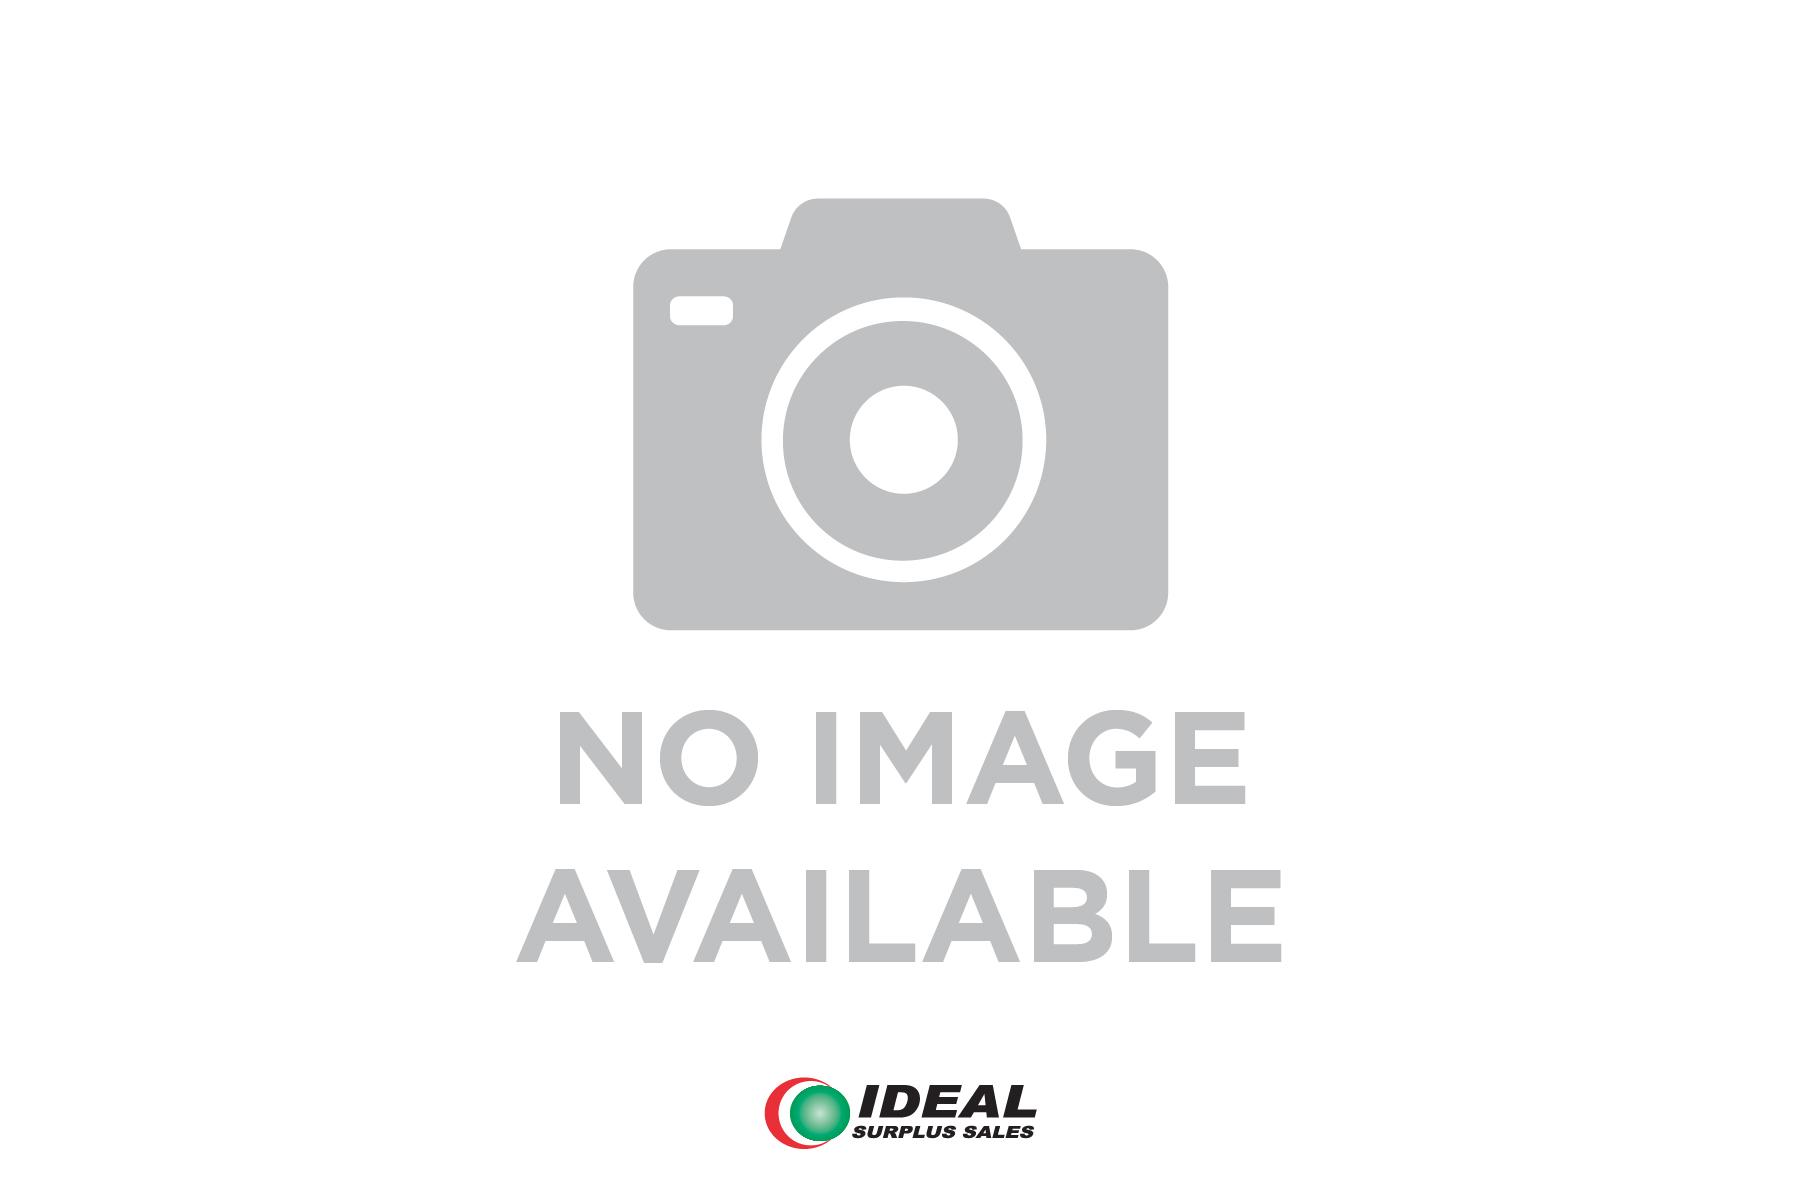 HOKE 6324F4B FILTER NEW IN BOX